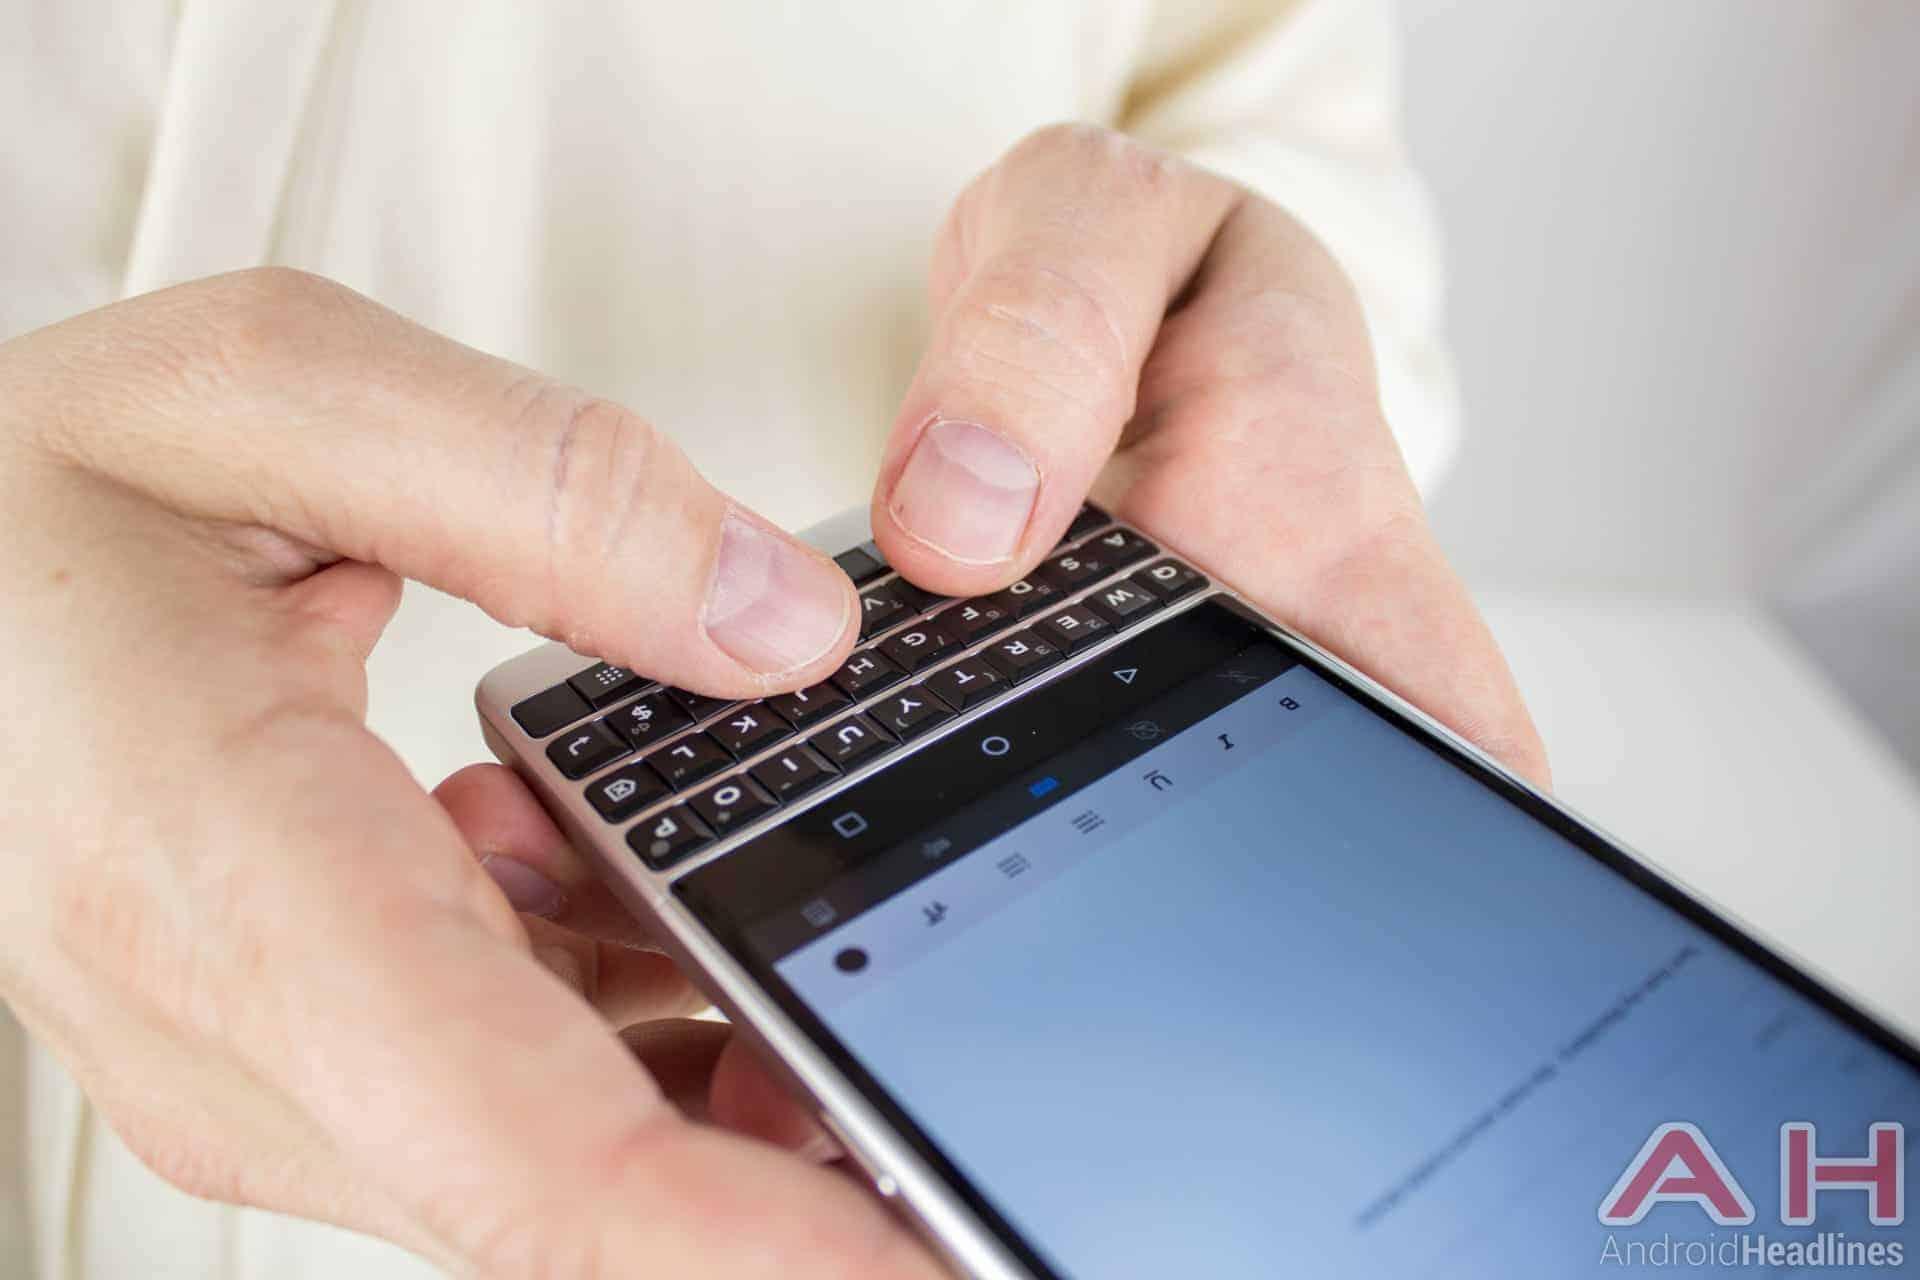 Blackberry KEY2 AH NS 33 keyboard use